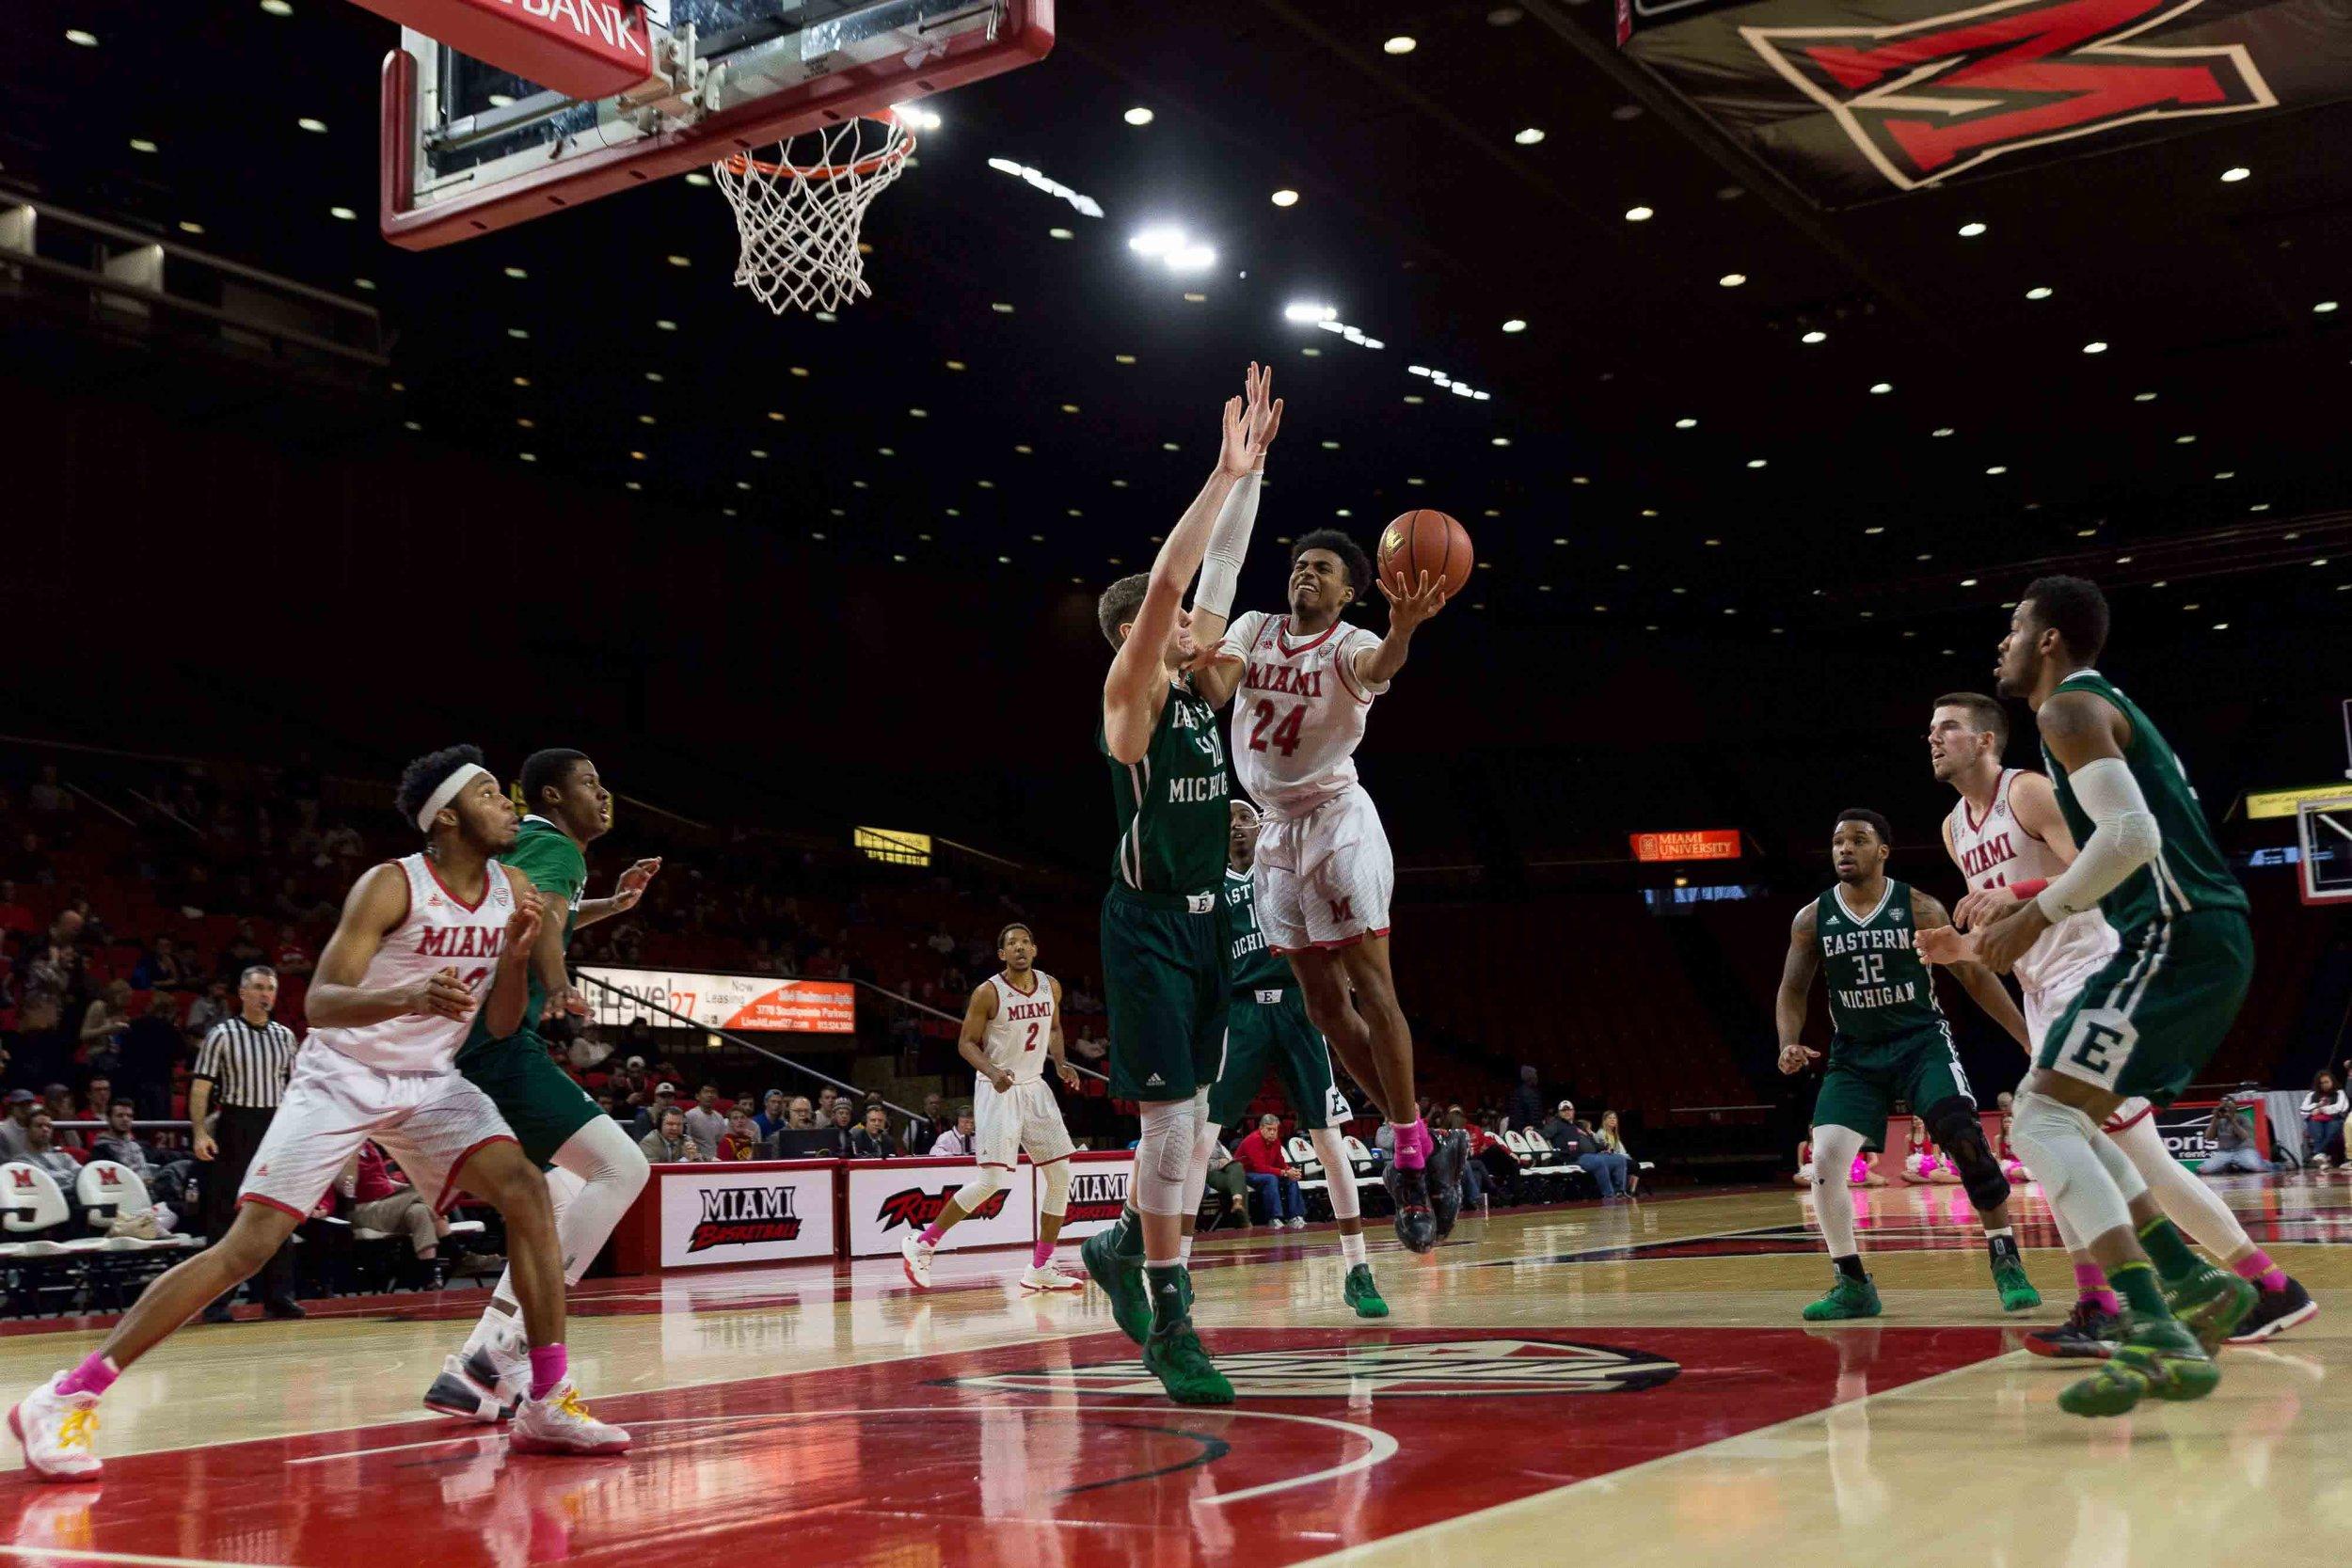 D8517 Men's Basketball vs Eastern Michigan University